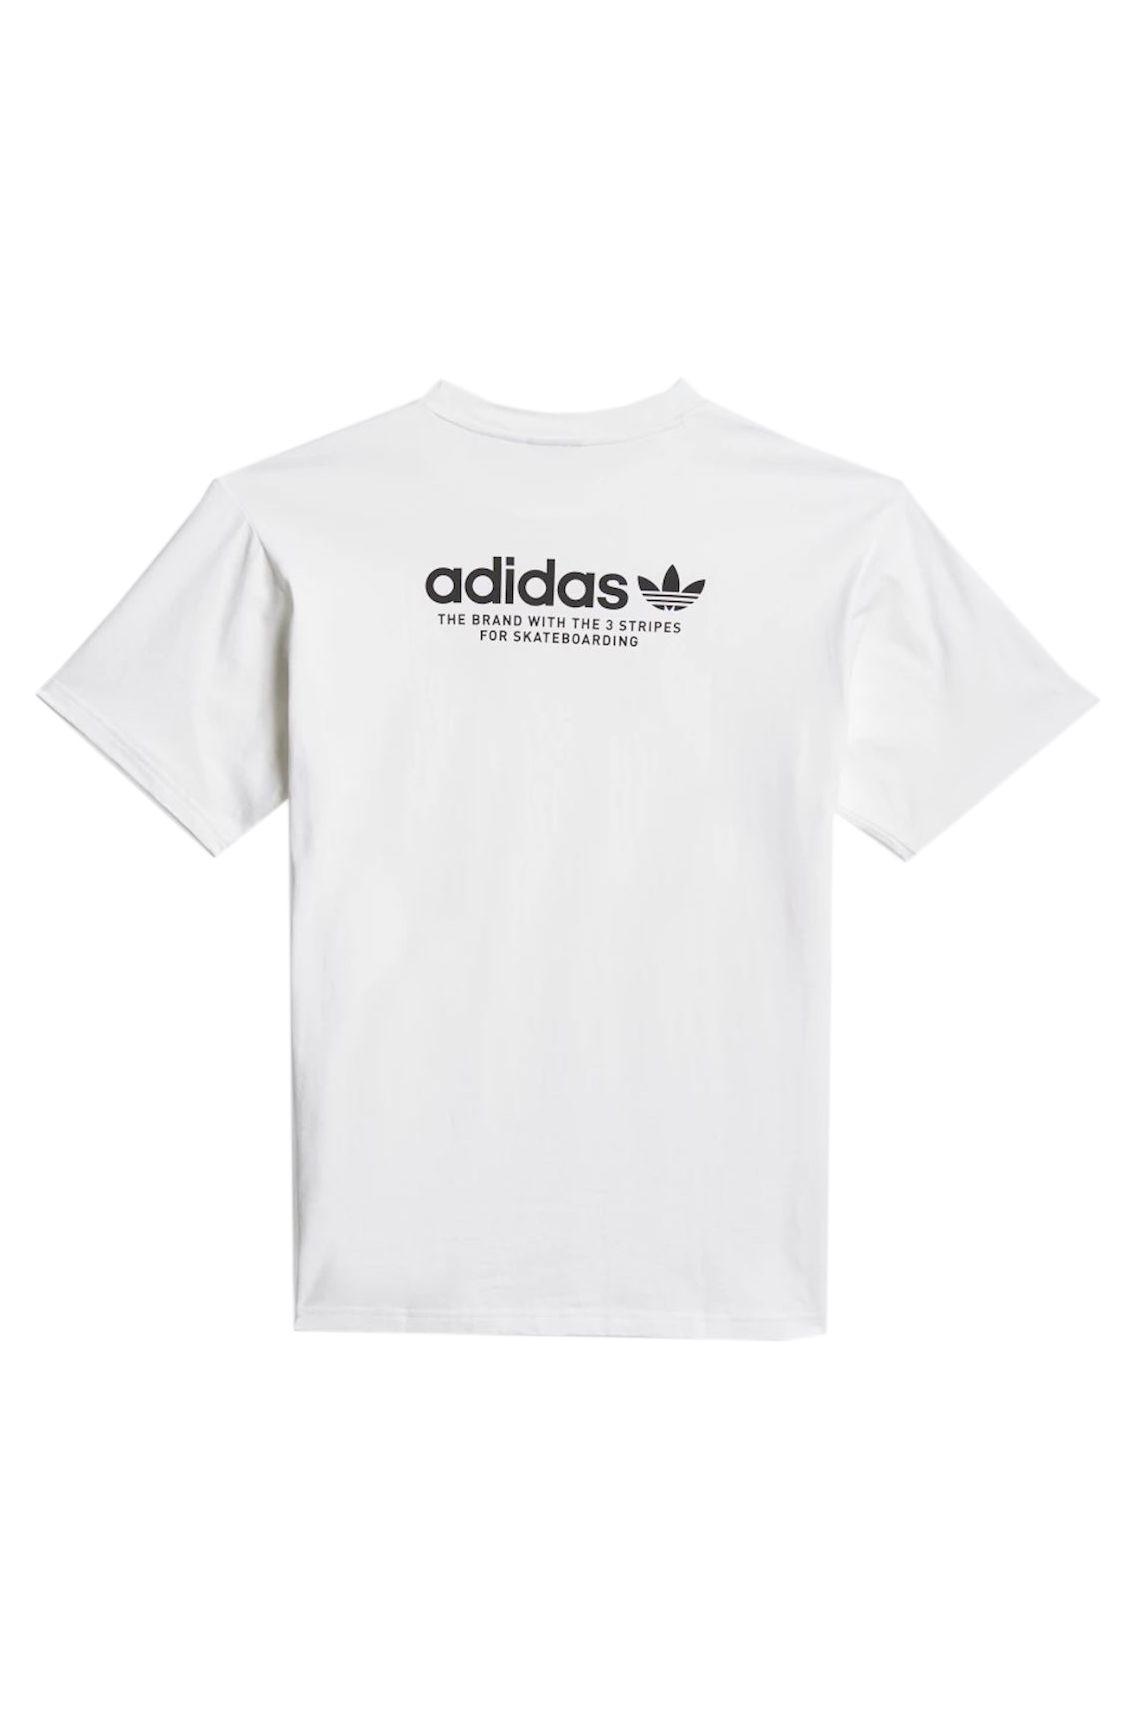 T-Shirt Adidas 4.0 LOGO SS TEE White/Black